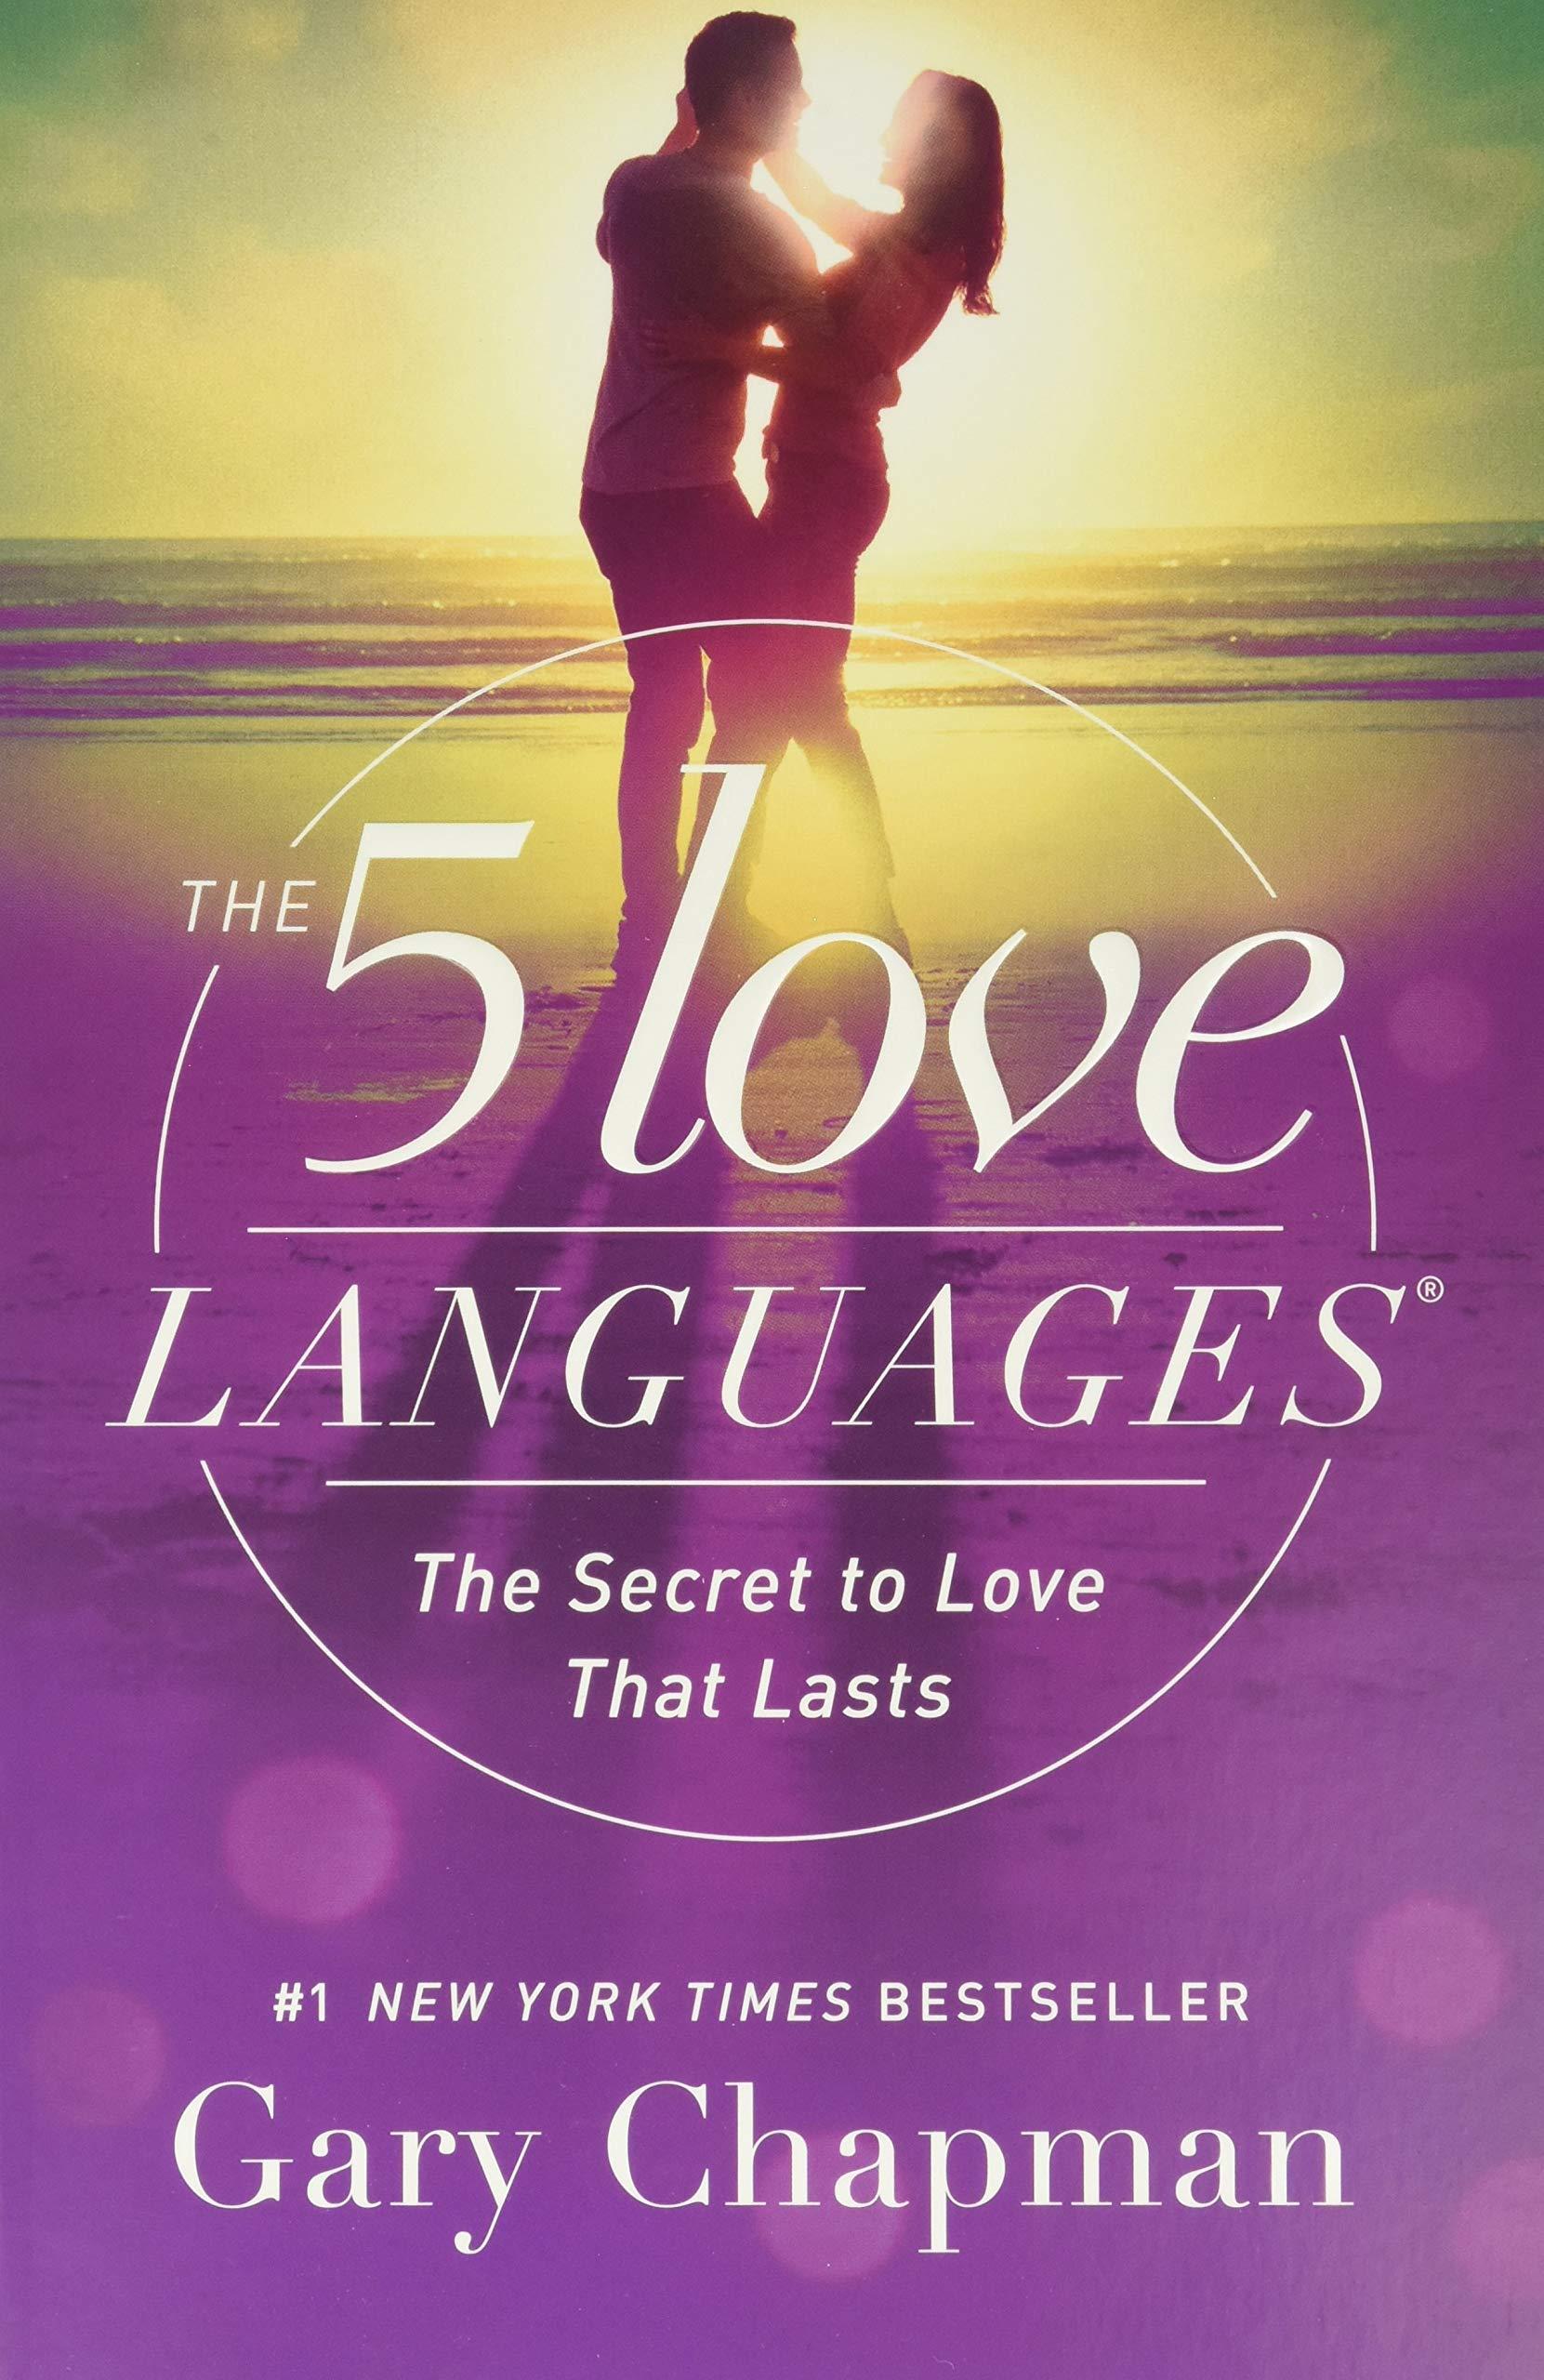 دانلود نسخه انگلیسی کتاب 5 زبان عشق | The 5 Love Languages